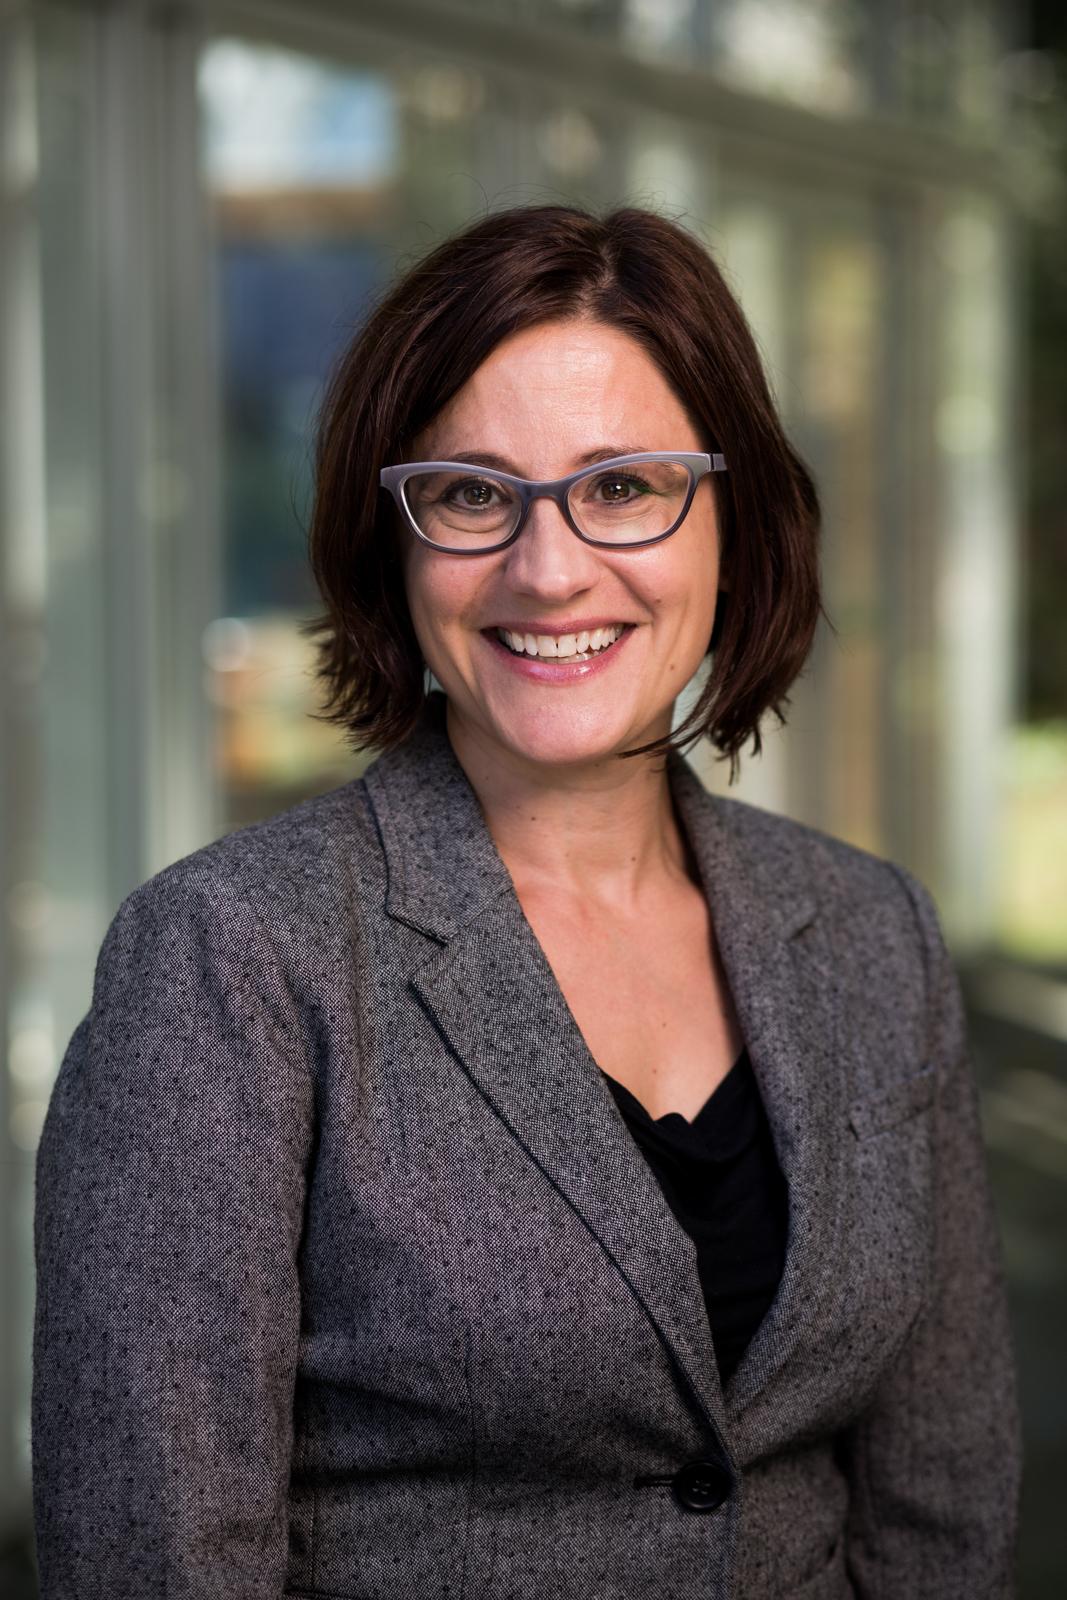 profile image for Vikki L. Rodgers